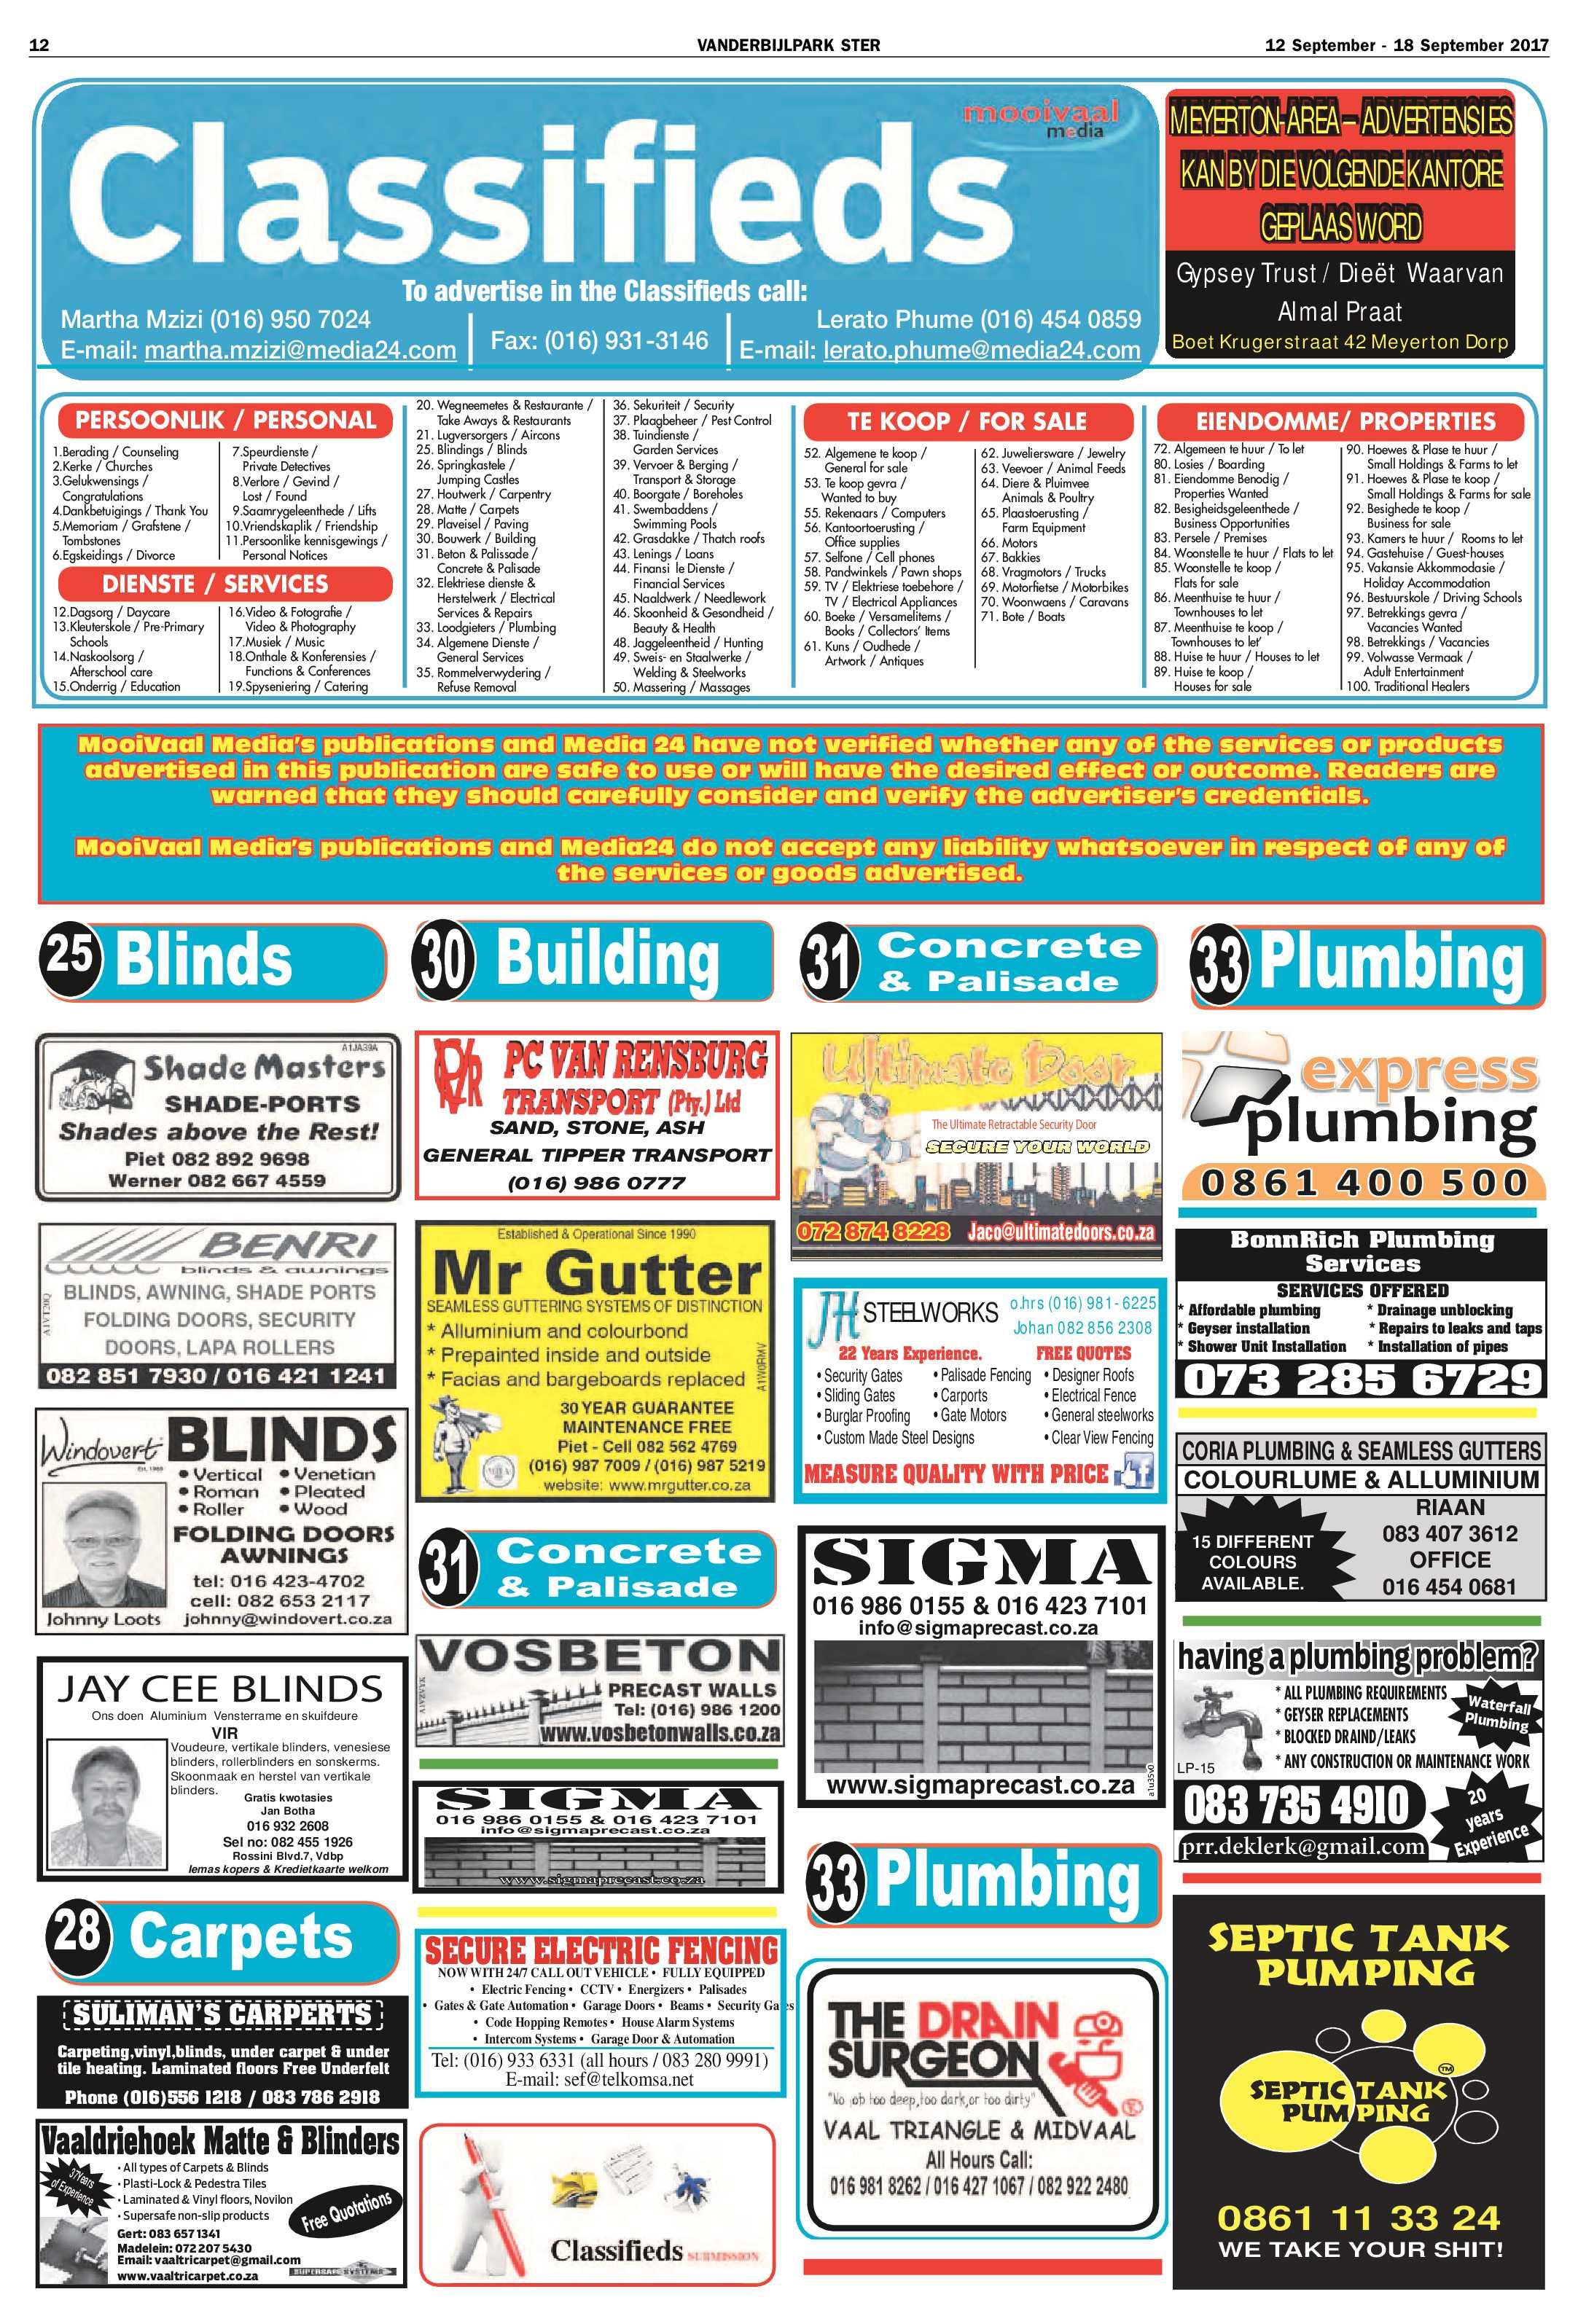 vanderbijlpark-ster-12-18-september-2017-epapers-page-12